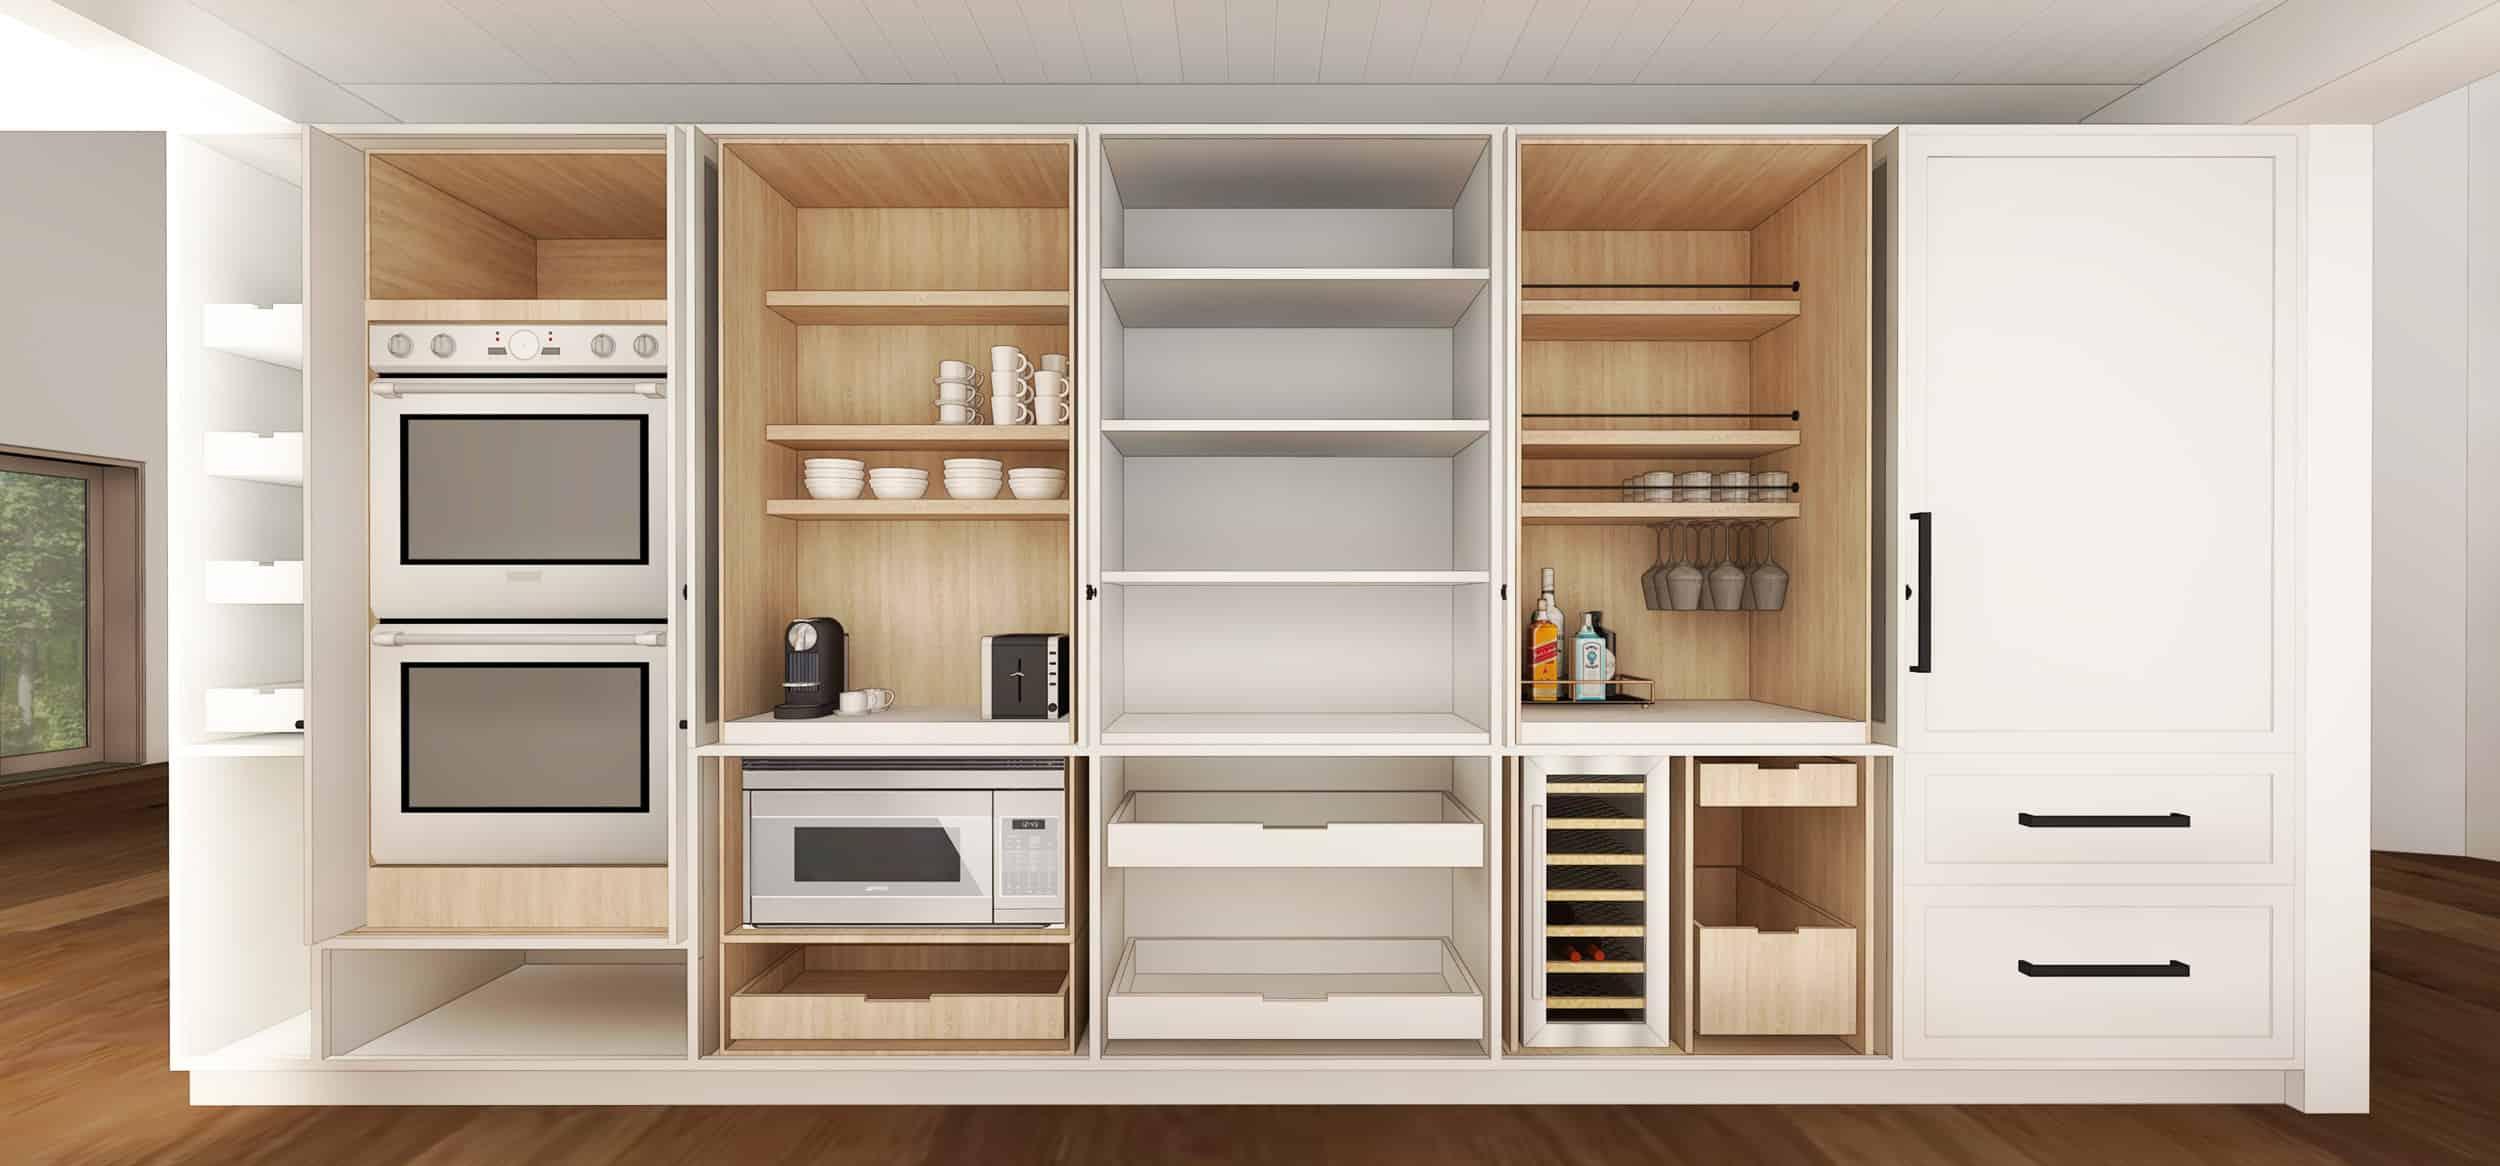 Emily Henderson Mountain House Kitchenskpmnt Option1 Interior Full Height Open